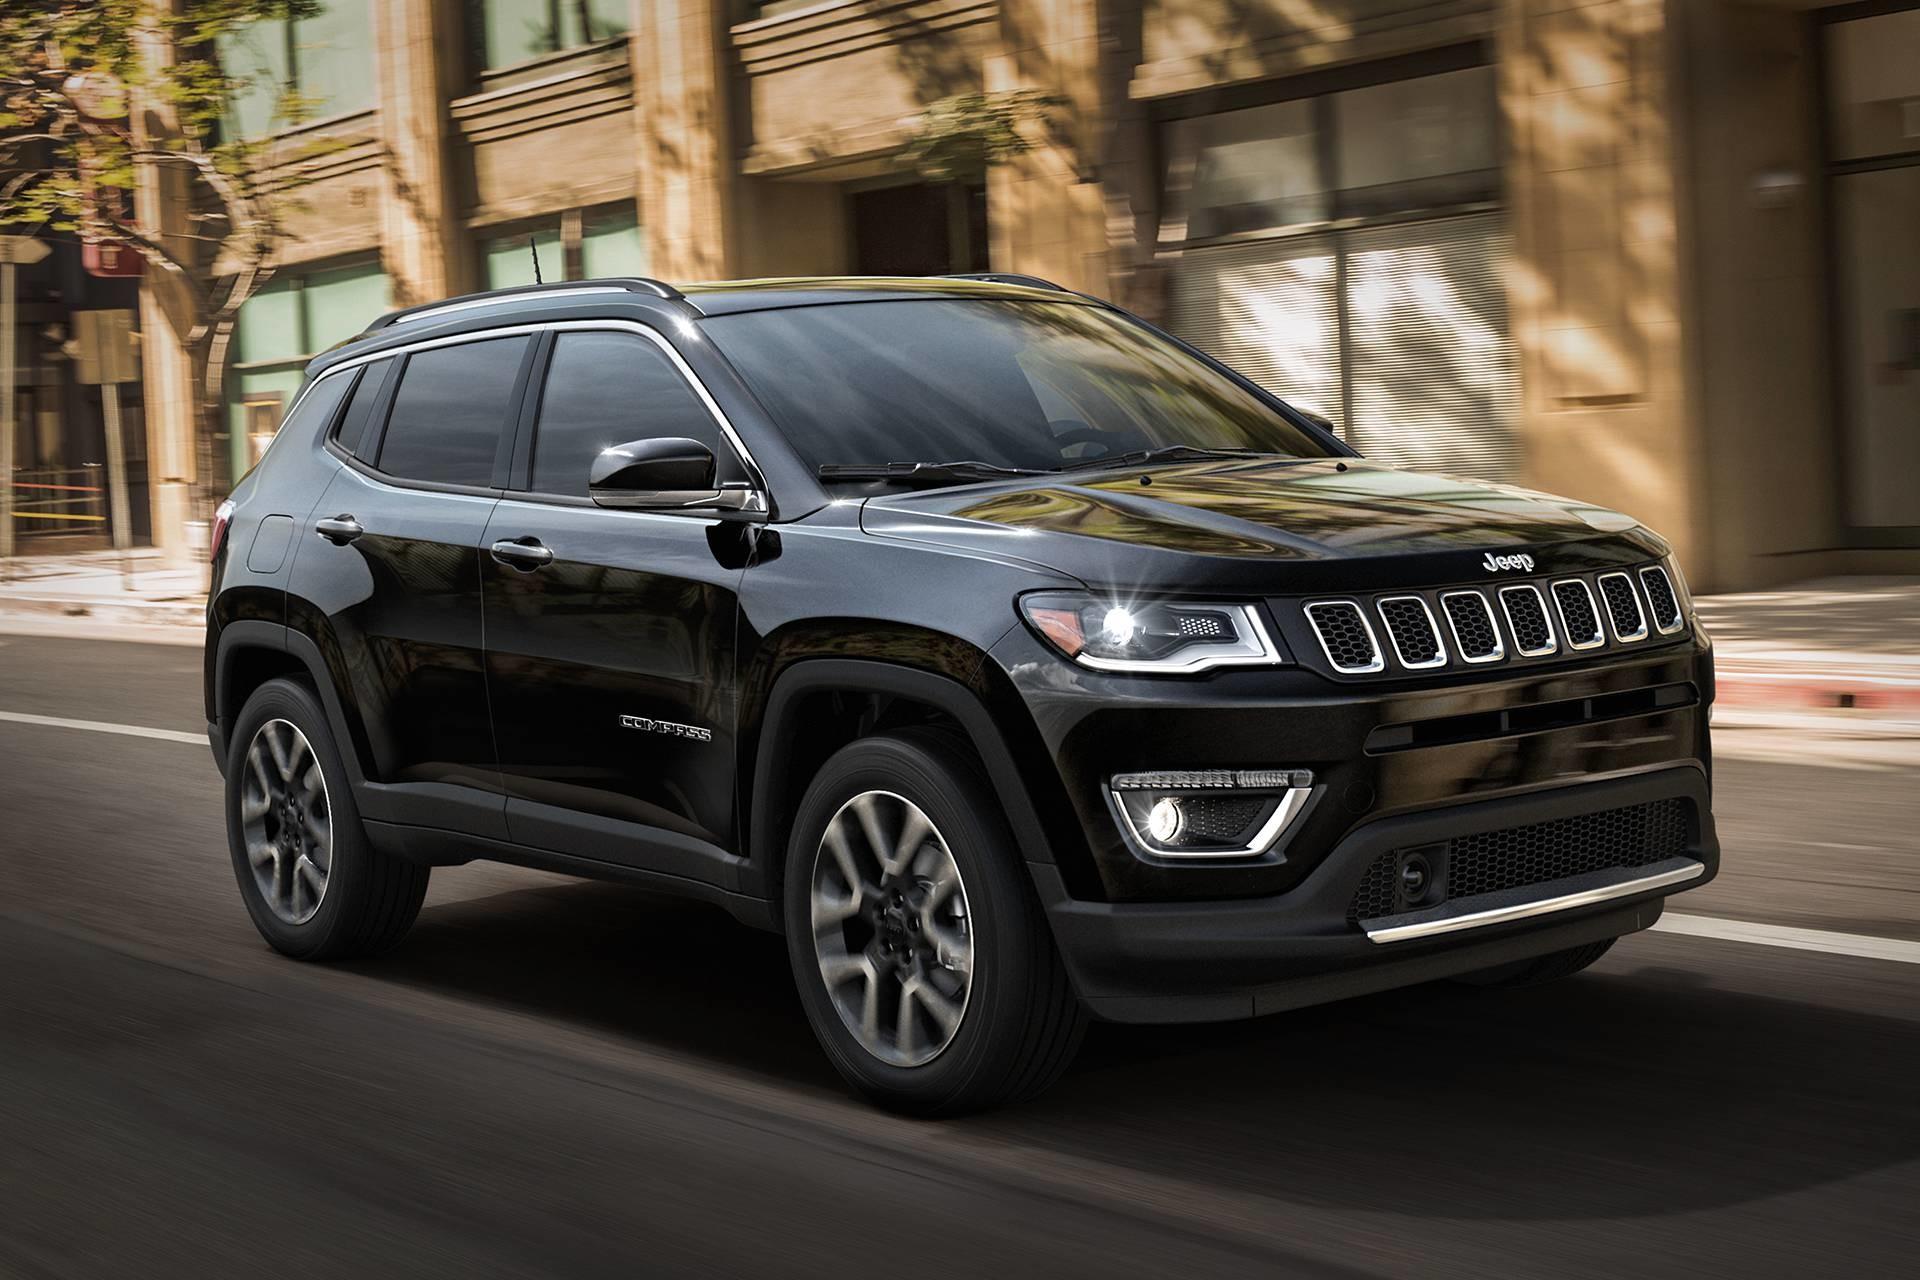 2019 Jeep Compass Compact SUV | Jeep Canada